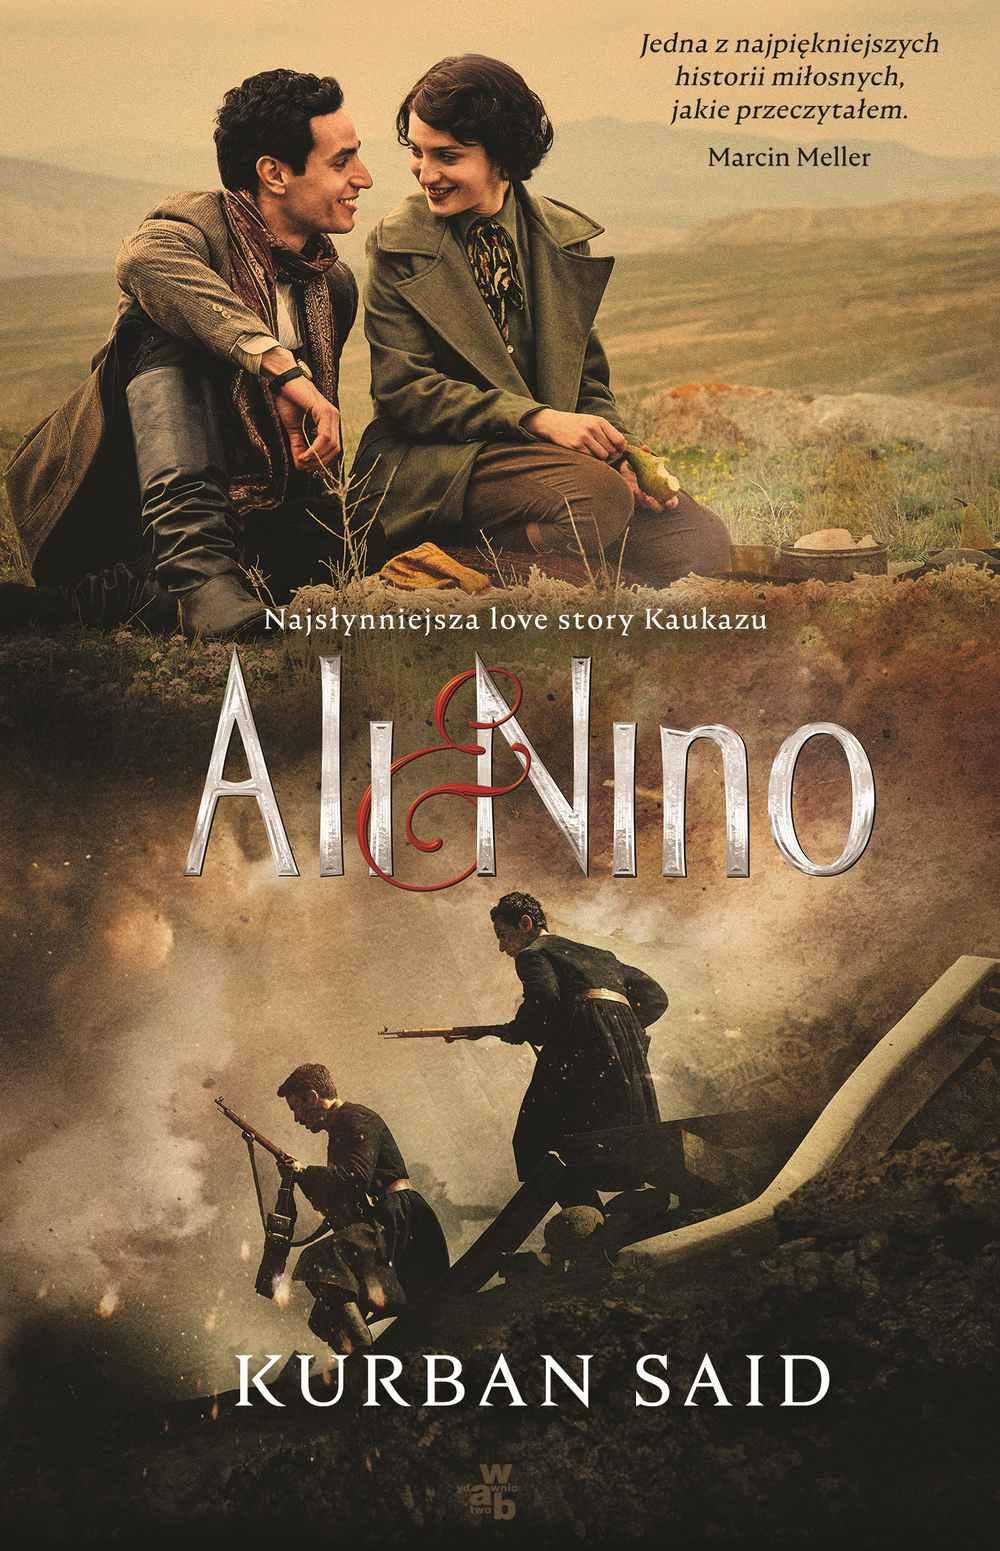 Ali i Nino - Ebook (Książka na Kindle) do pobrania w formacie MOBI